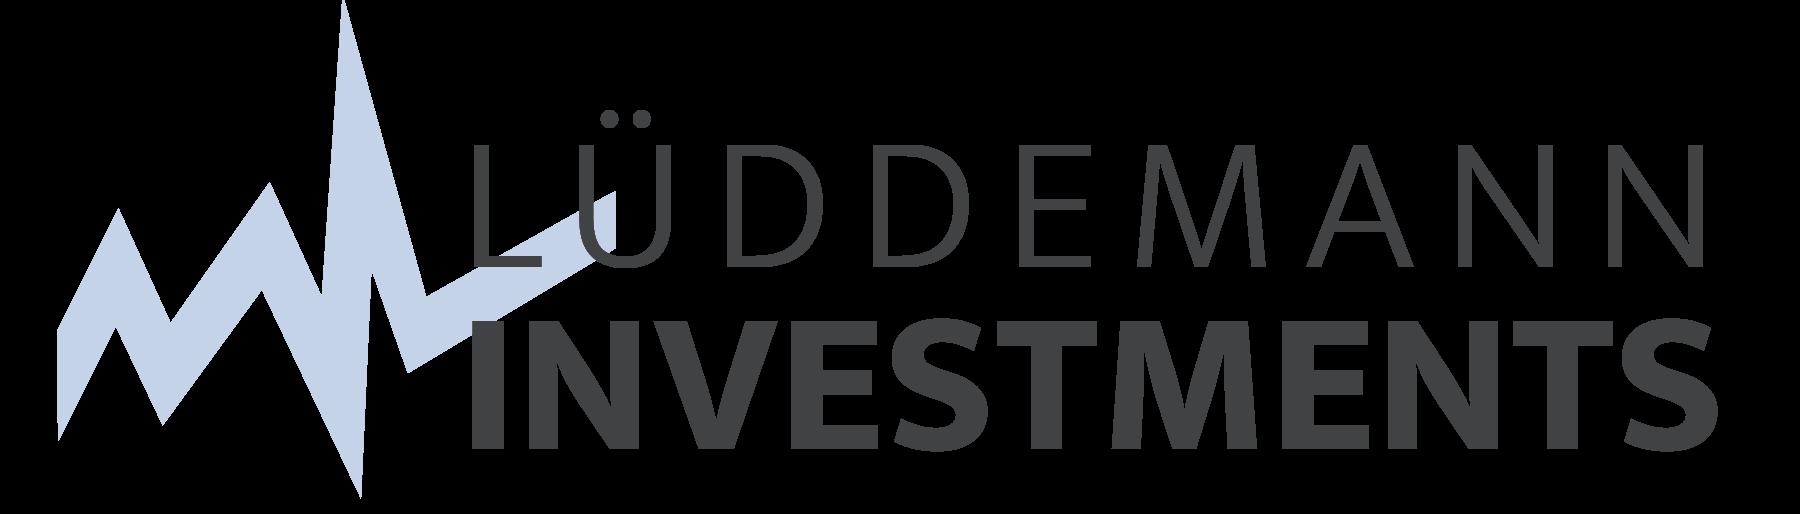 Lüddemann Investments GmbH